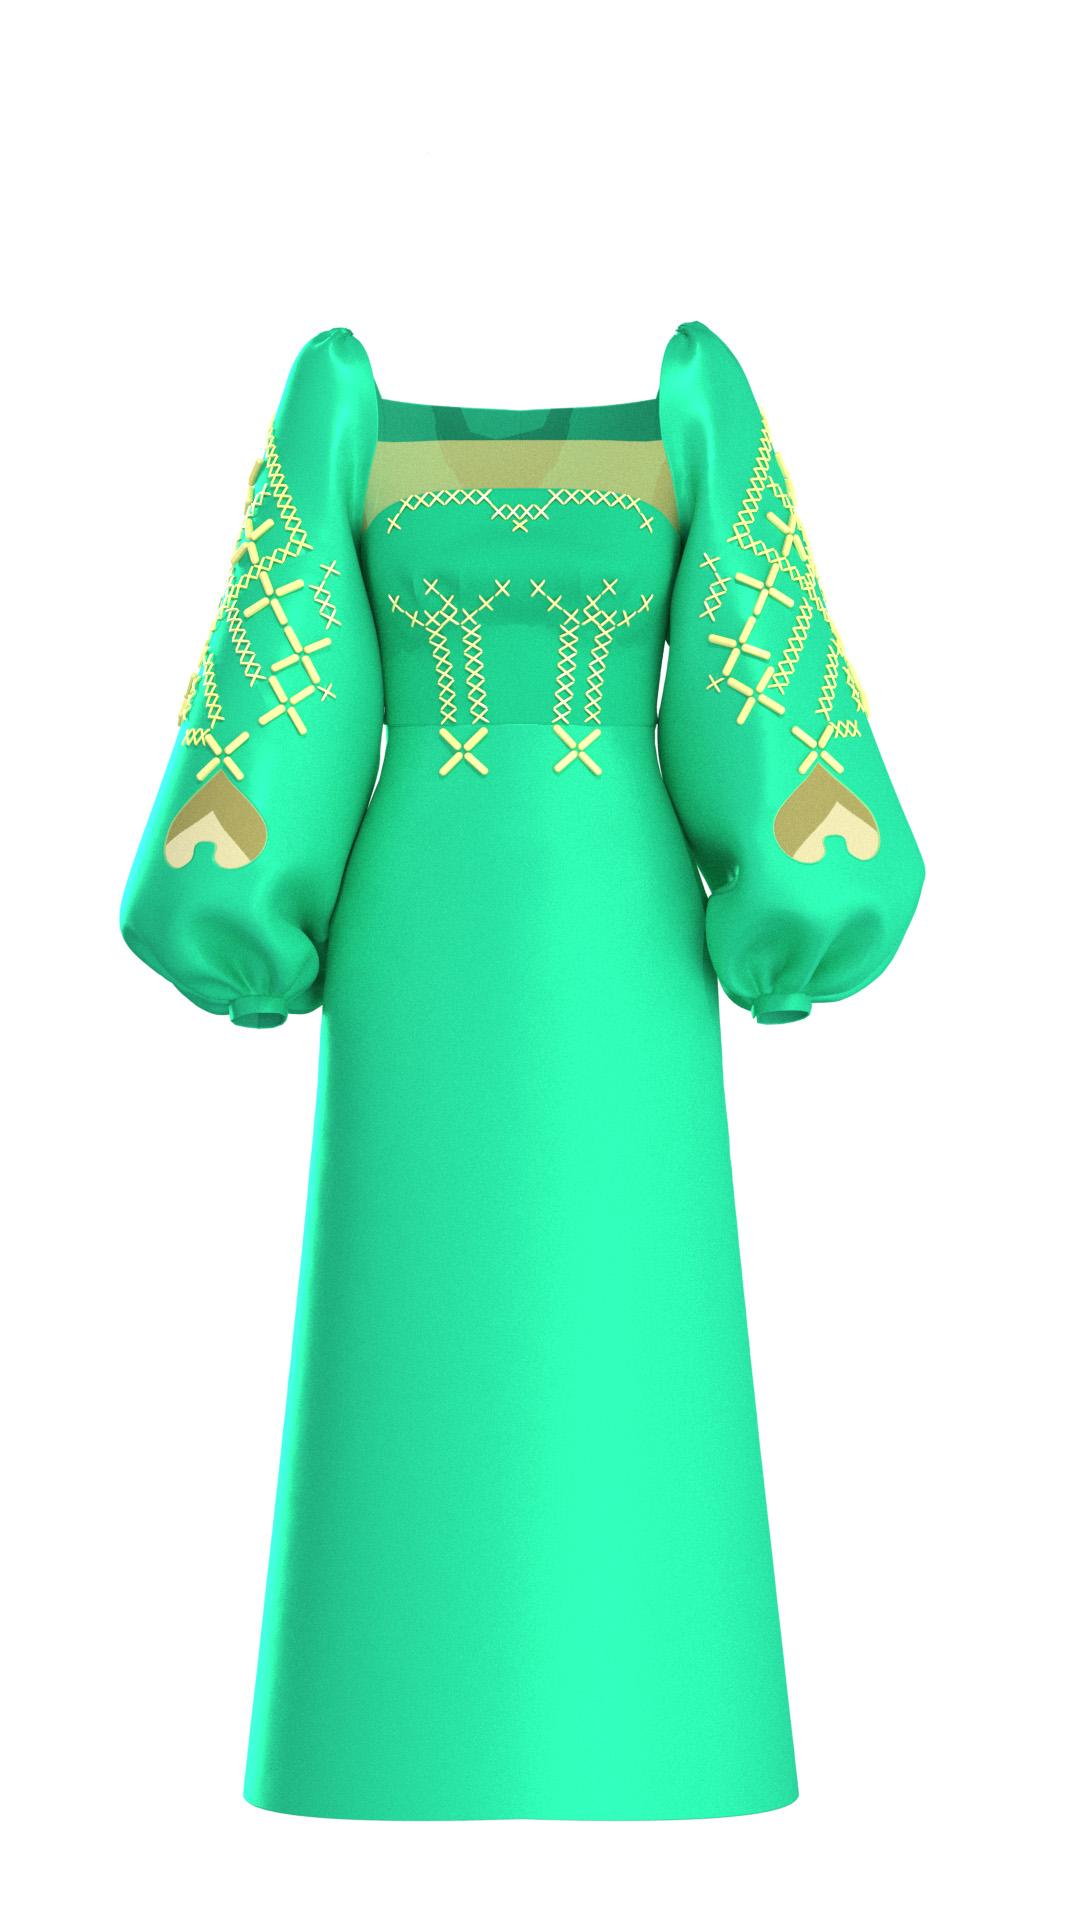 Alena Akhmadullina запускает продажу виртуальной одежды